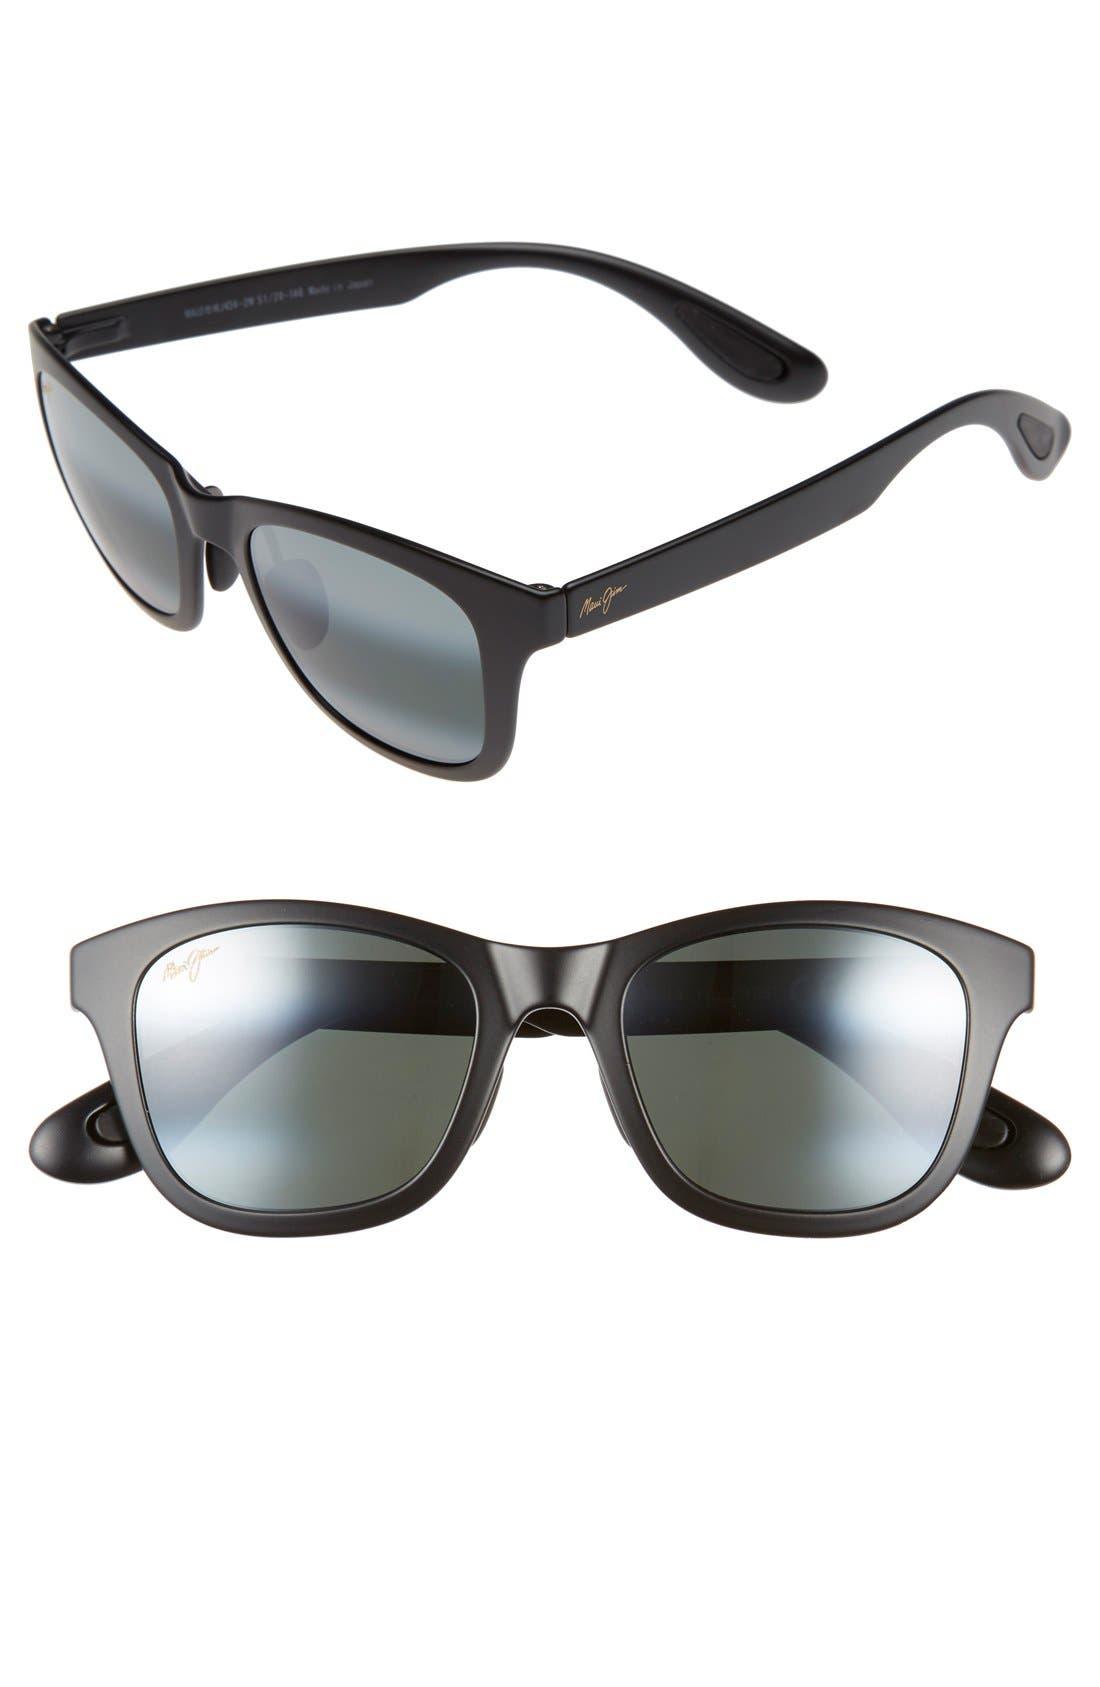 Hana Bay 51mm PolarizedPlus2<sup>®</sup> Sunglasses,                         Main,                         color, Matte Black/ Neutral Grey